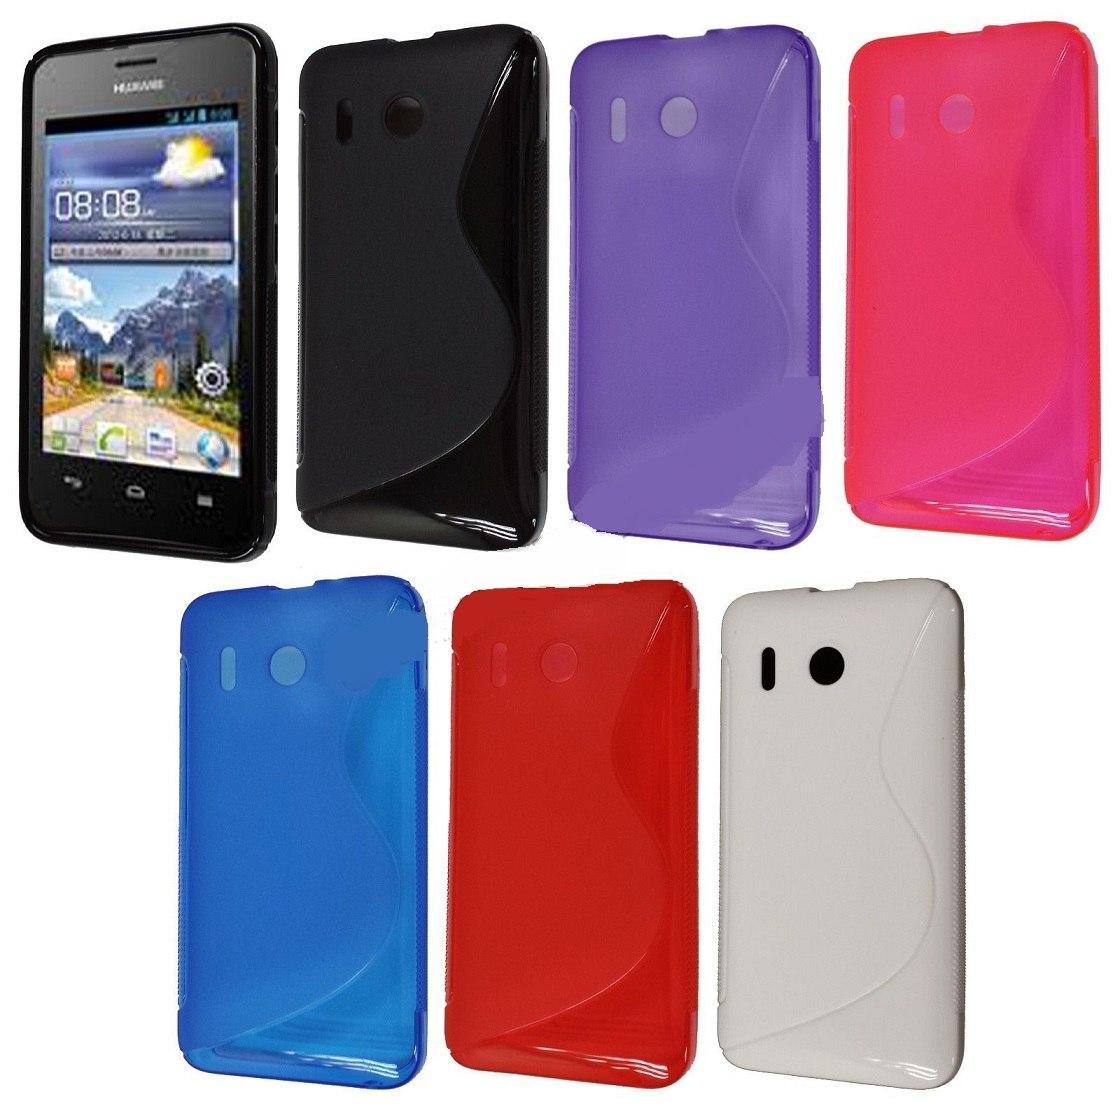 2 protector de gel para celular huawei ascend y320 38 for Protectores 3d para celular